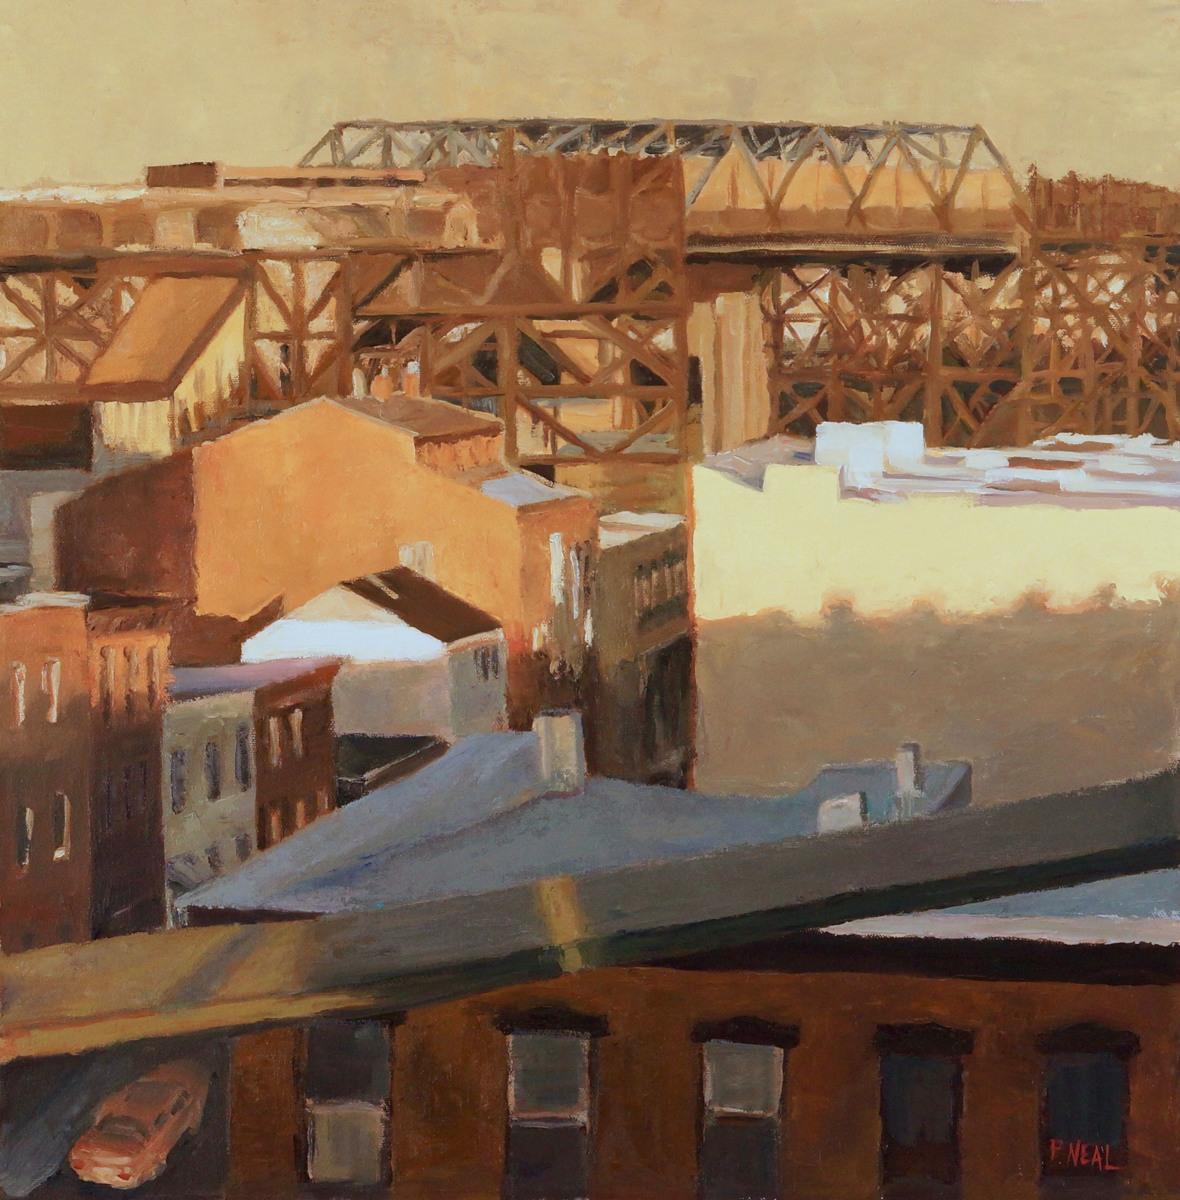 Trestle over Gowanus (large view)